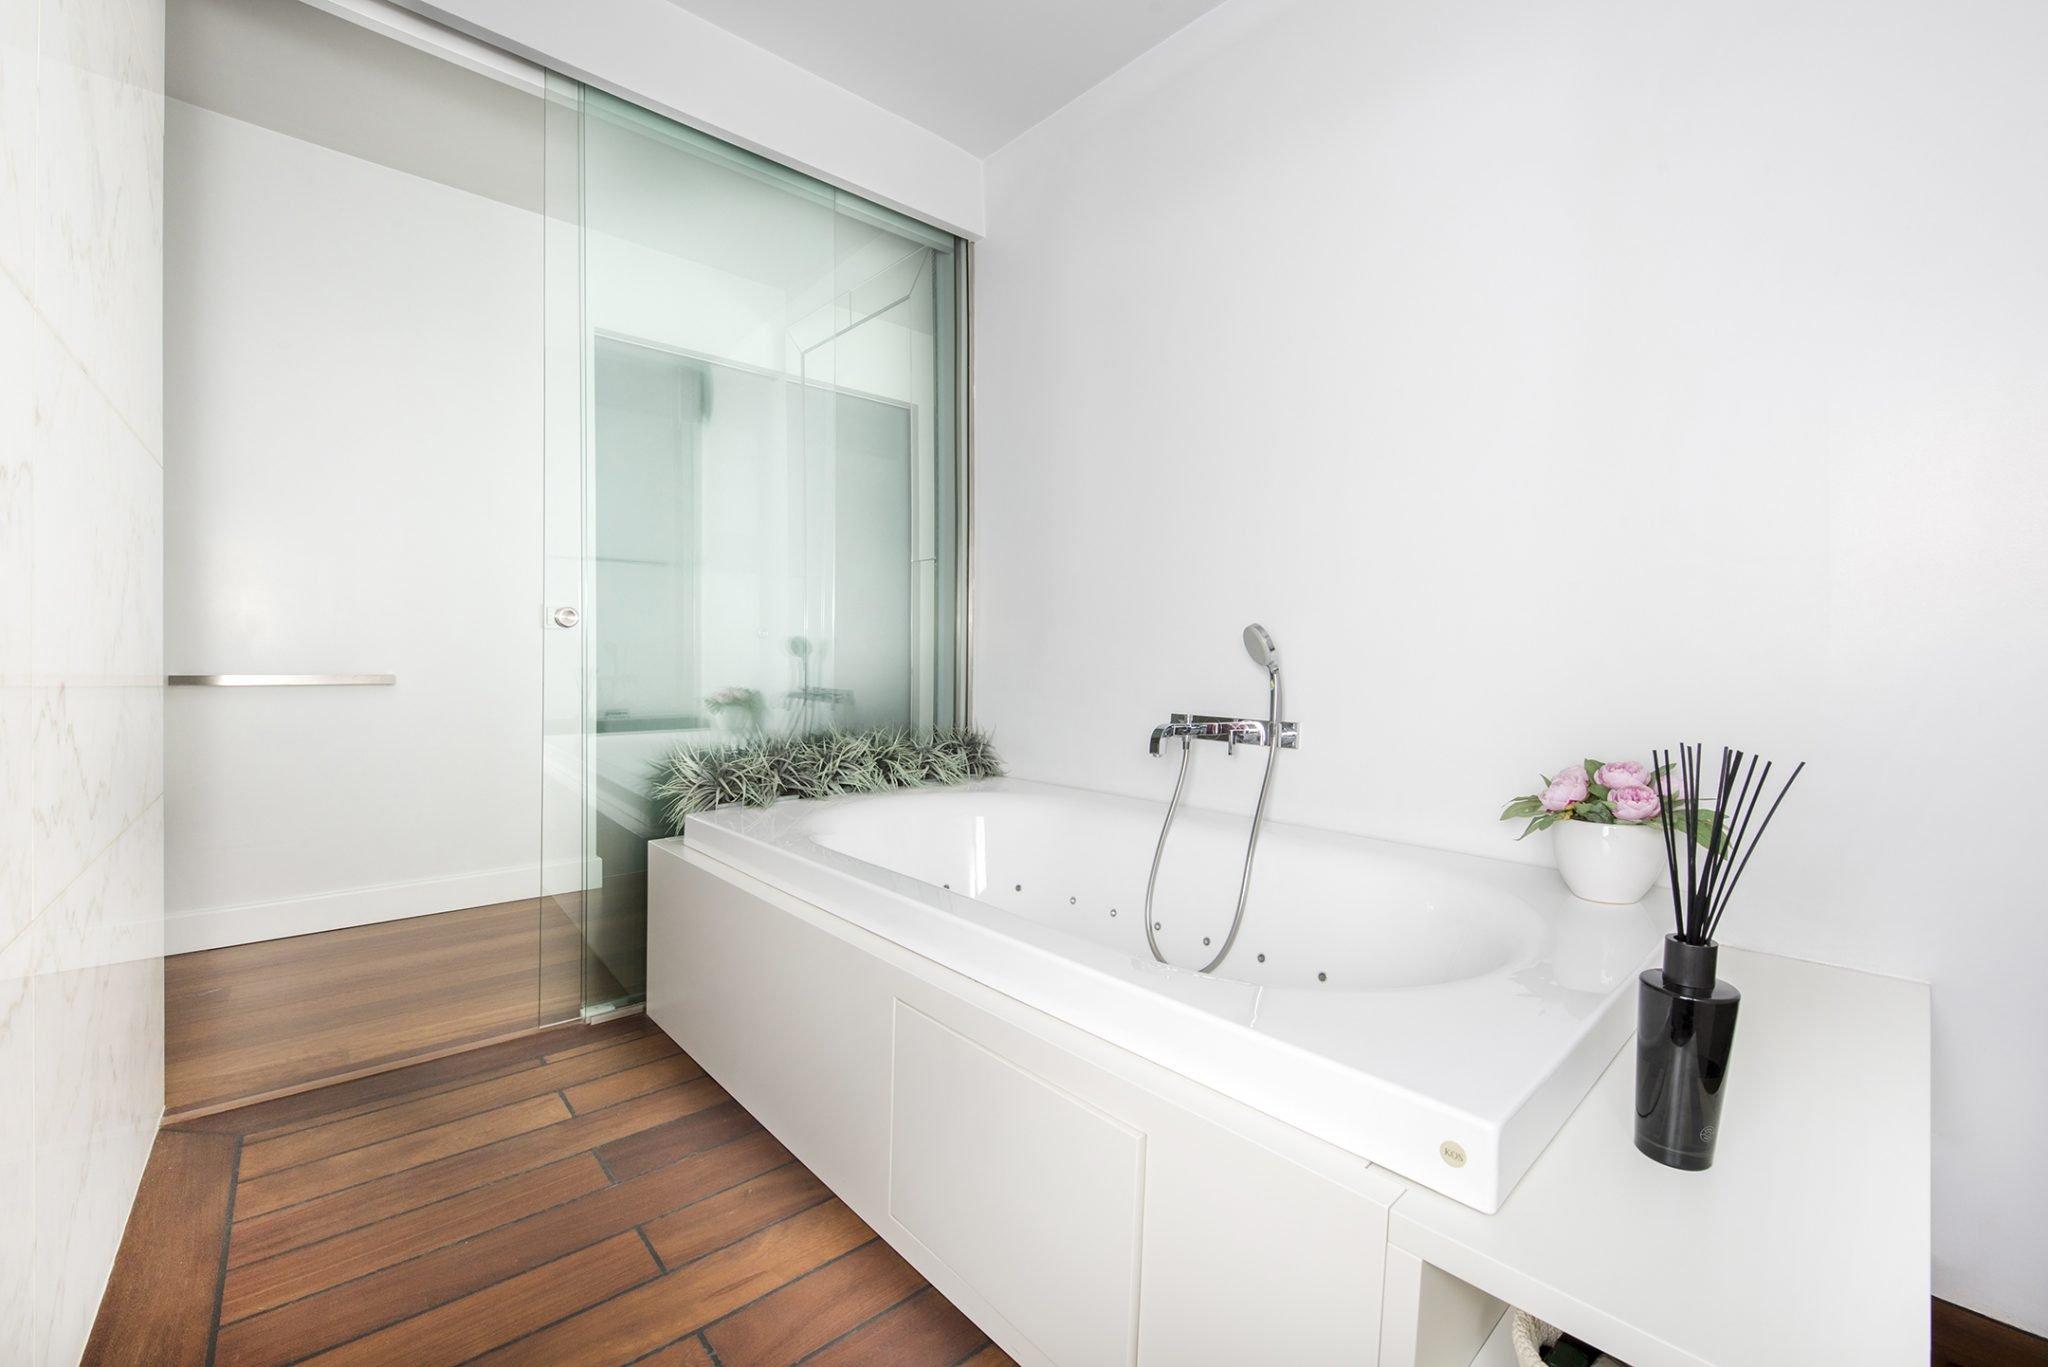 Kolonaki  - Appartement  - picture 10